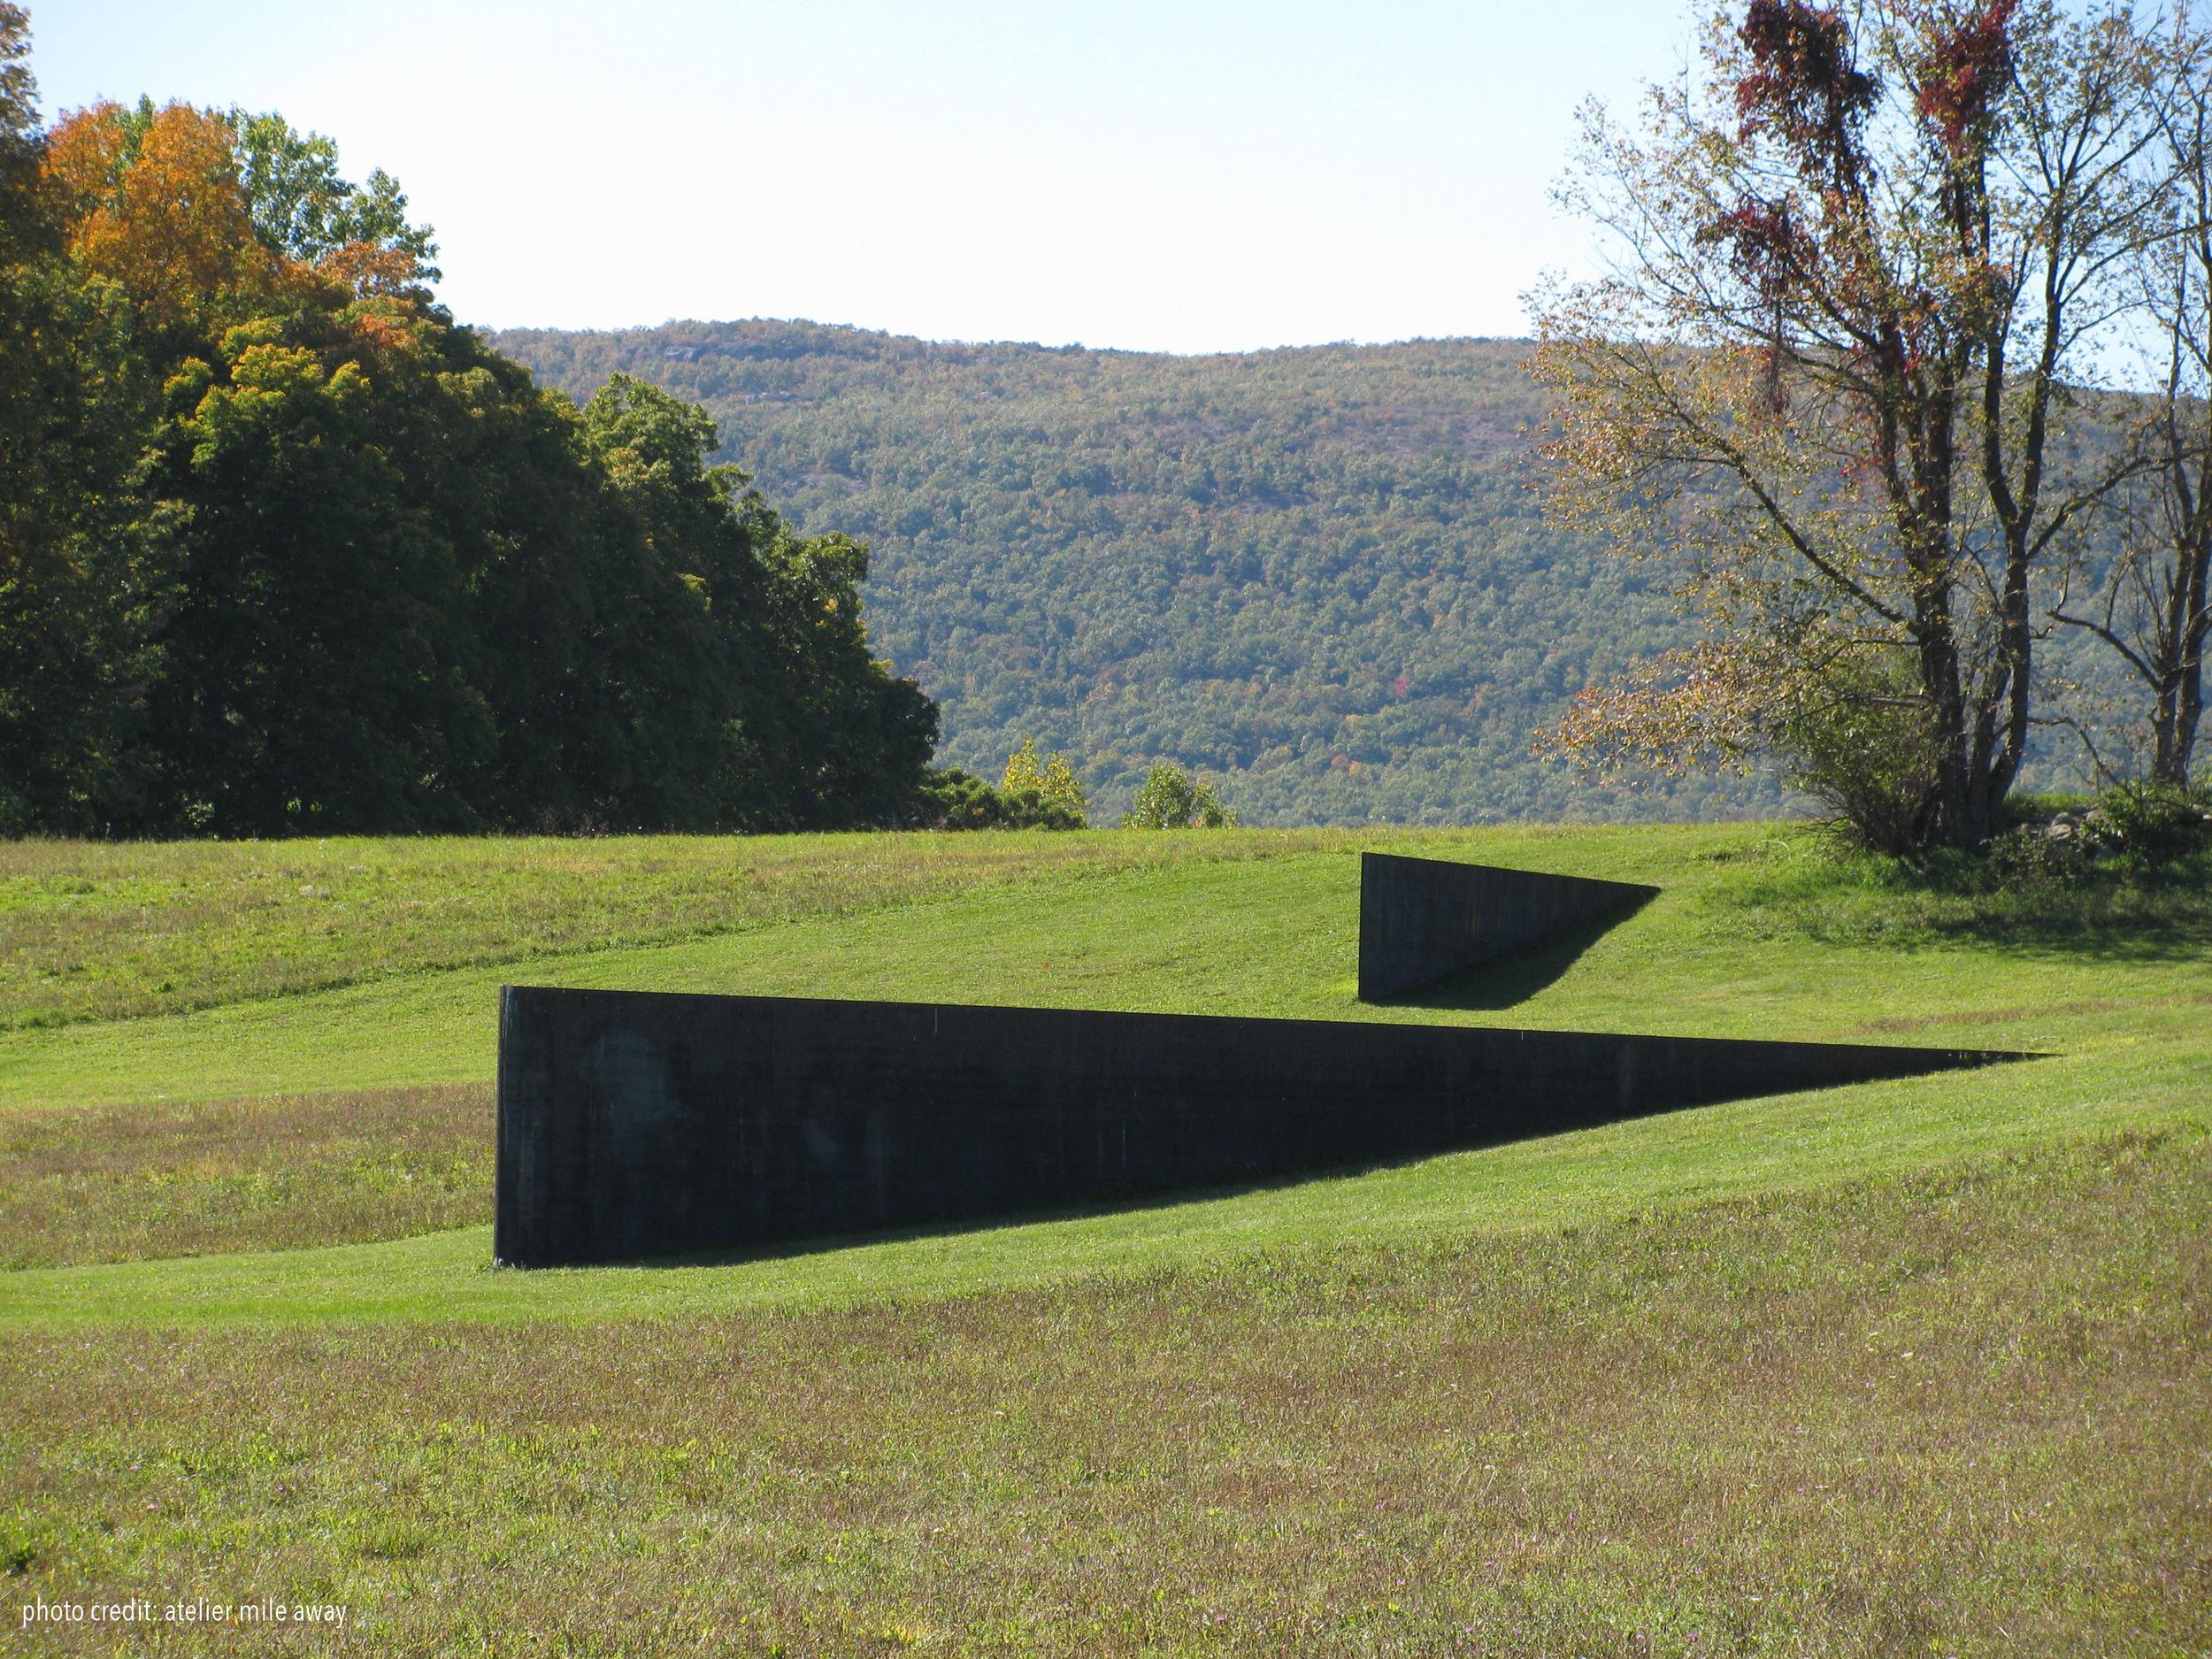 Storm King Art Center | Hudson Valley